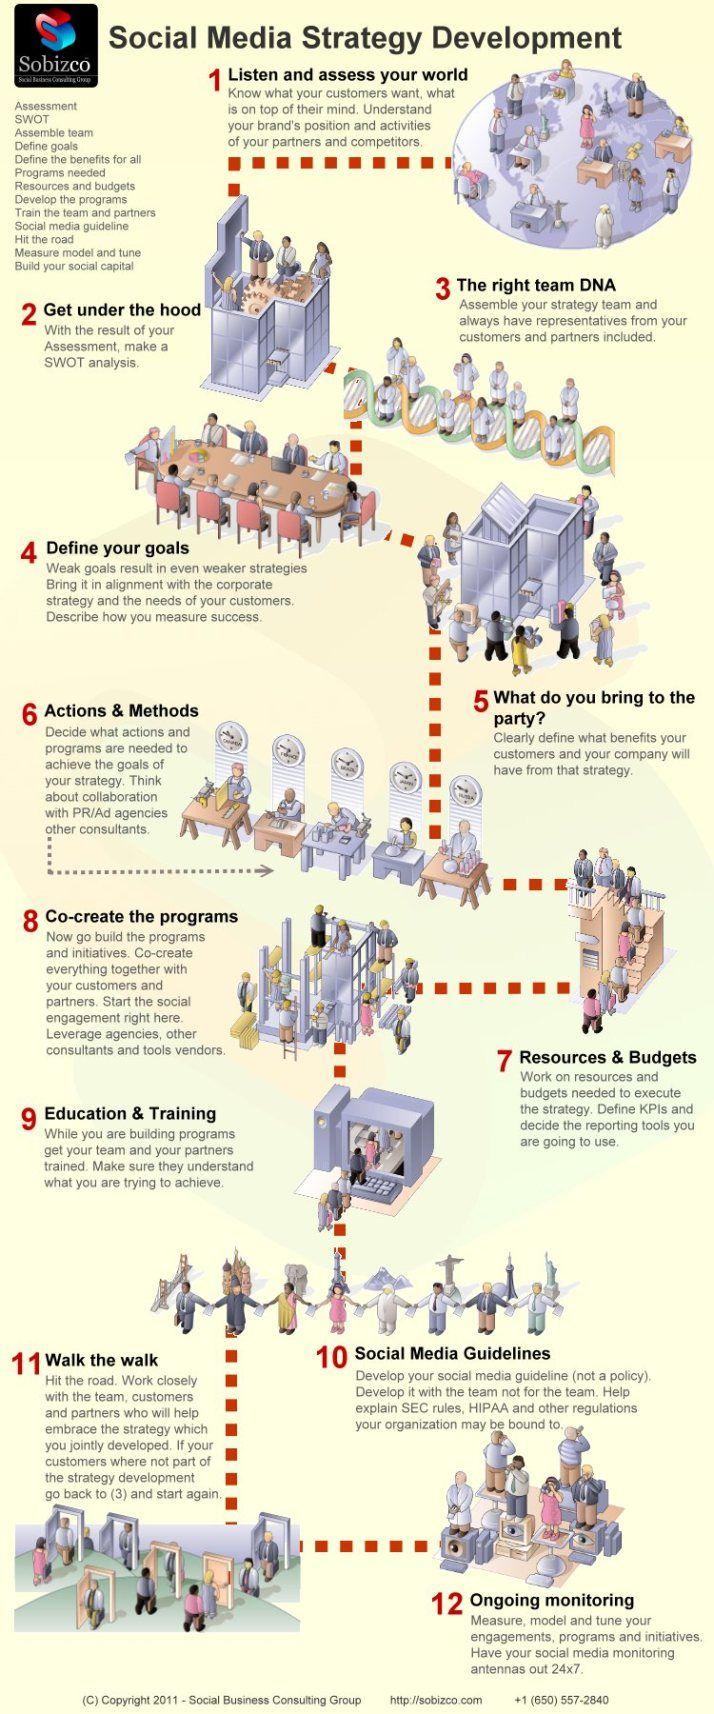 Social Media strategy development #infografia #infographic #socialmedia